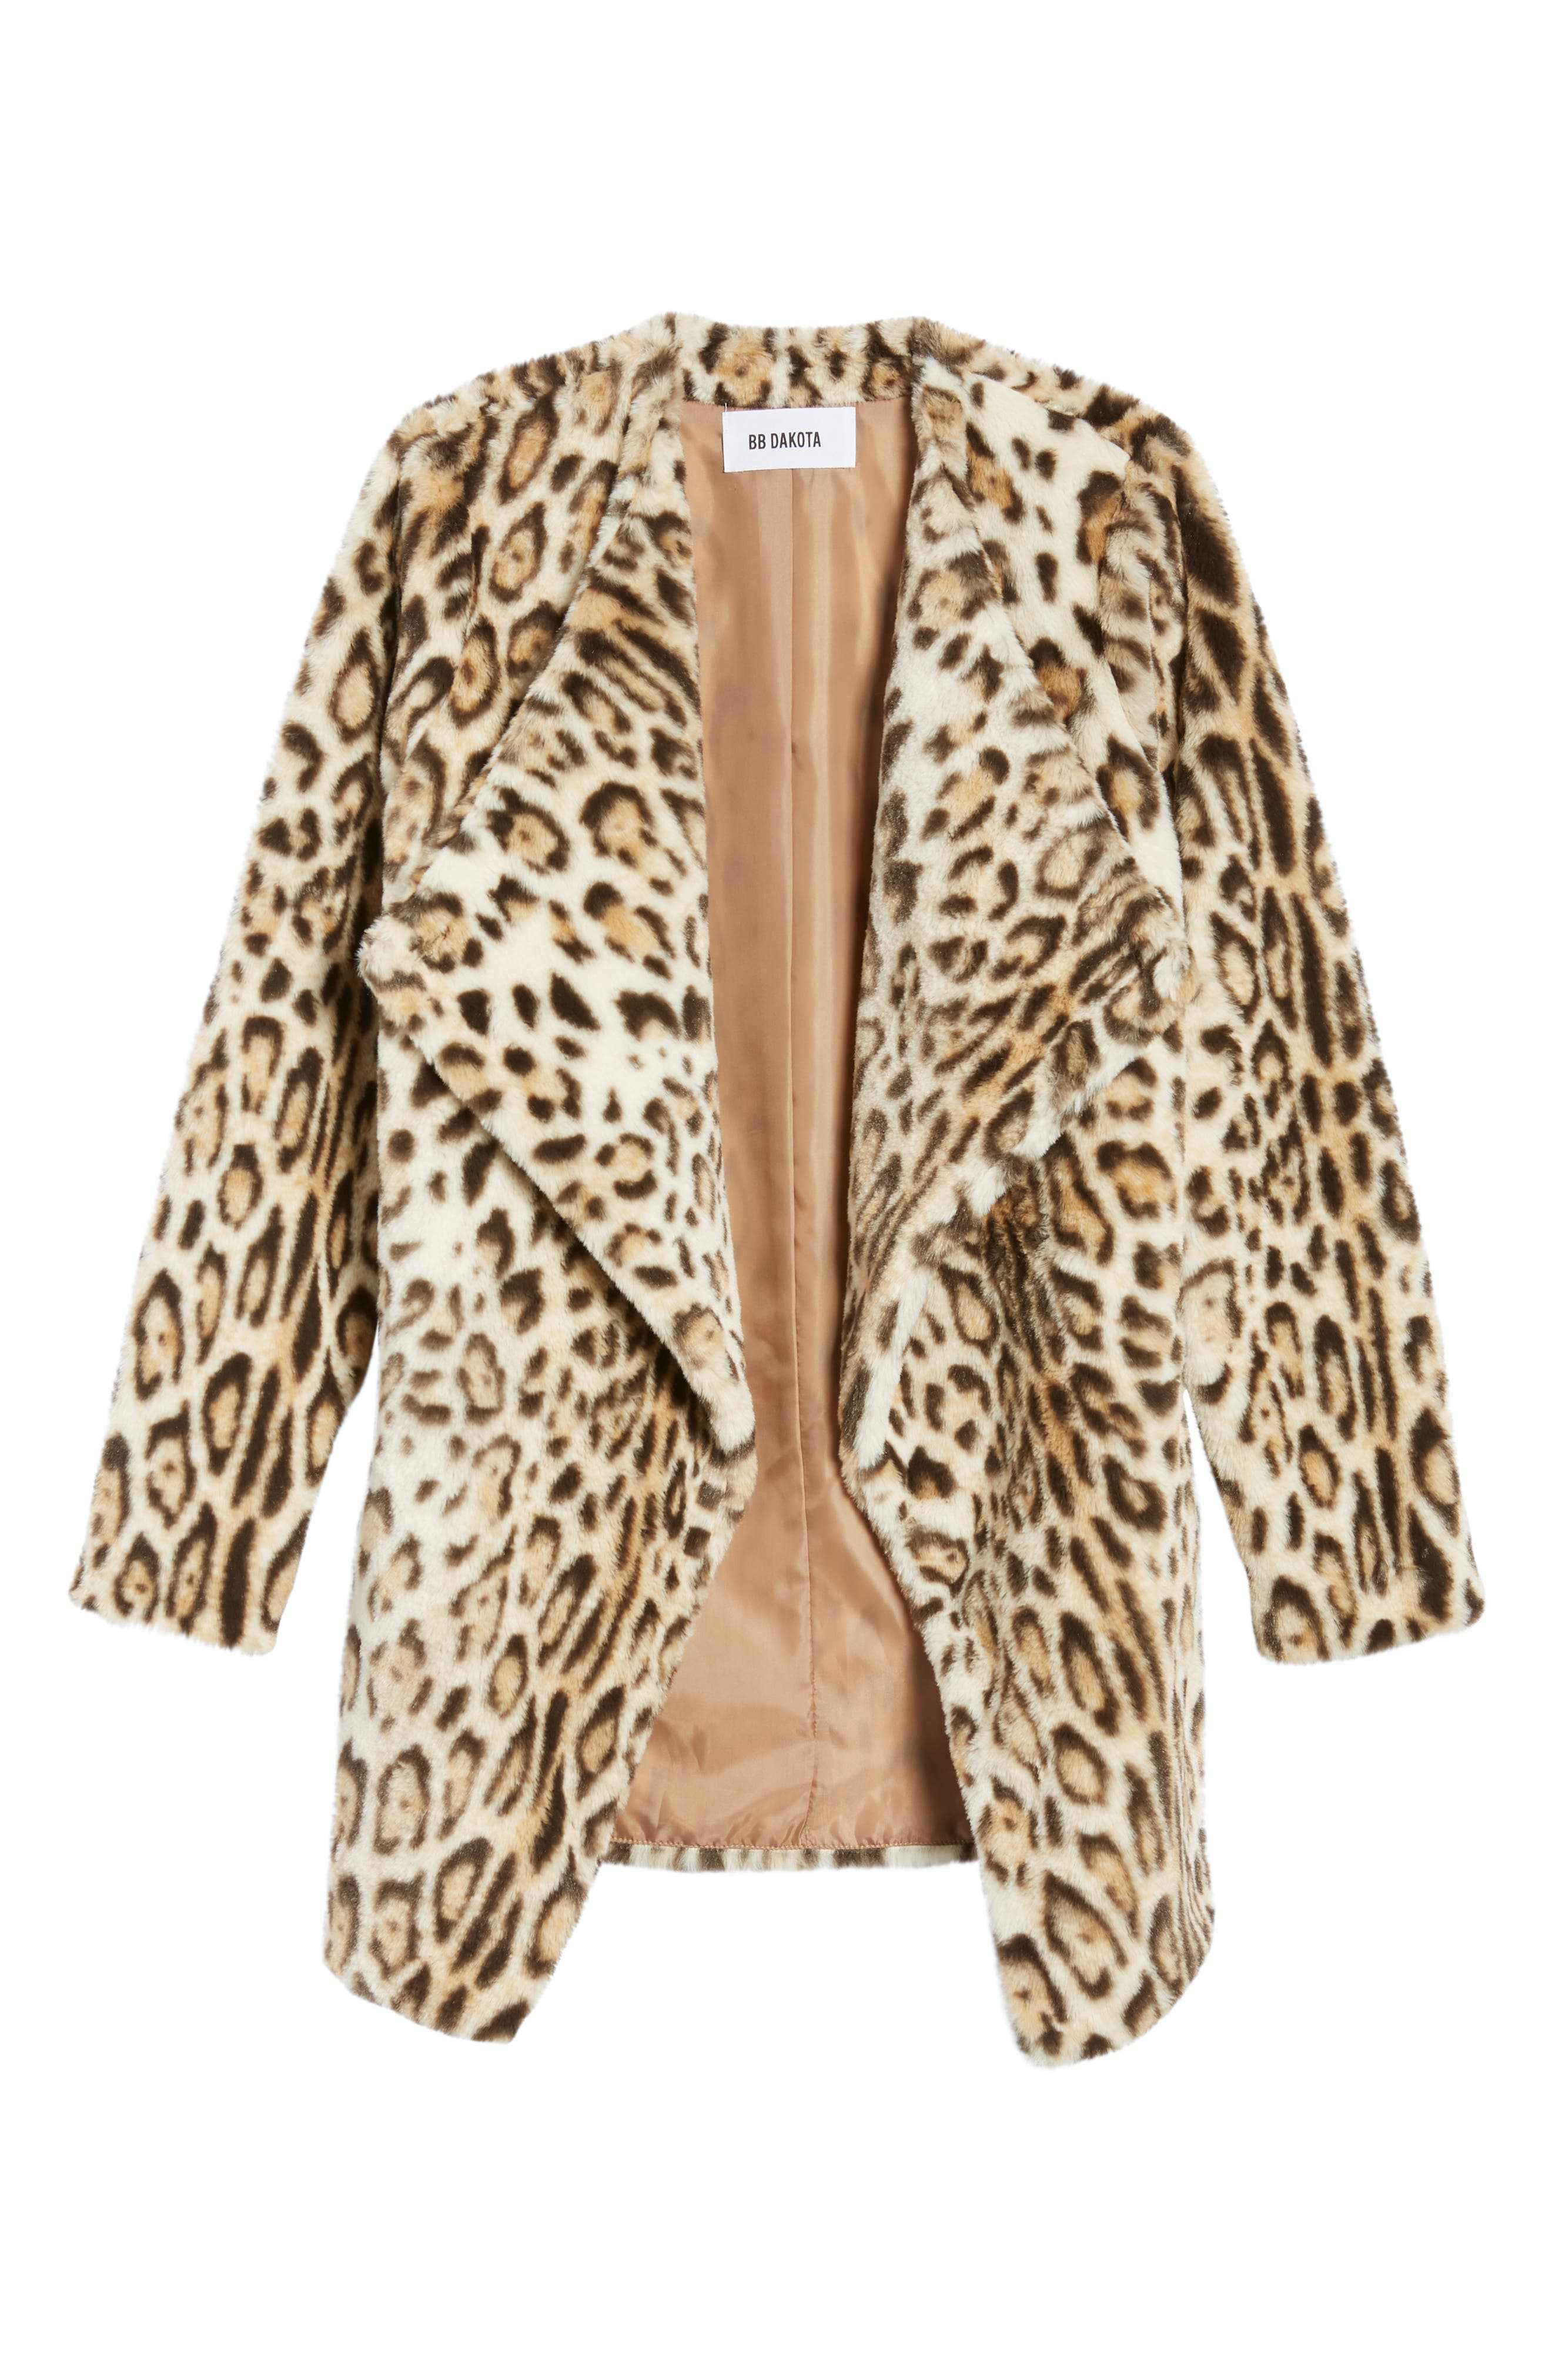 BB DAKOTA,                             Leopard Faux Fur Jacket,                             Alternate thumbnail 5, color,                             210